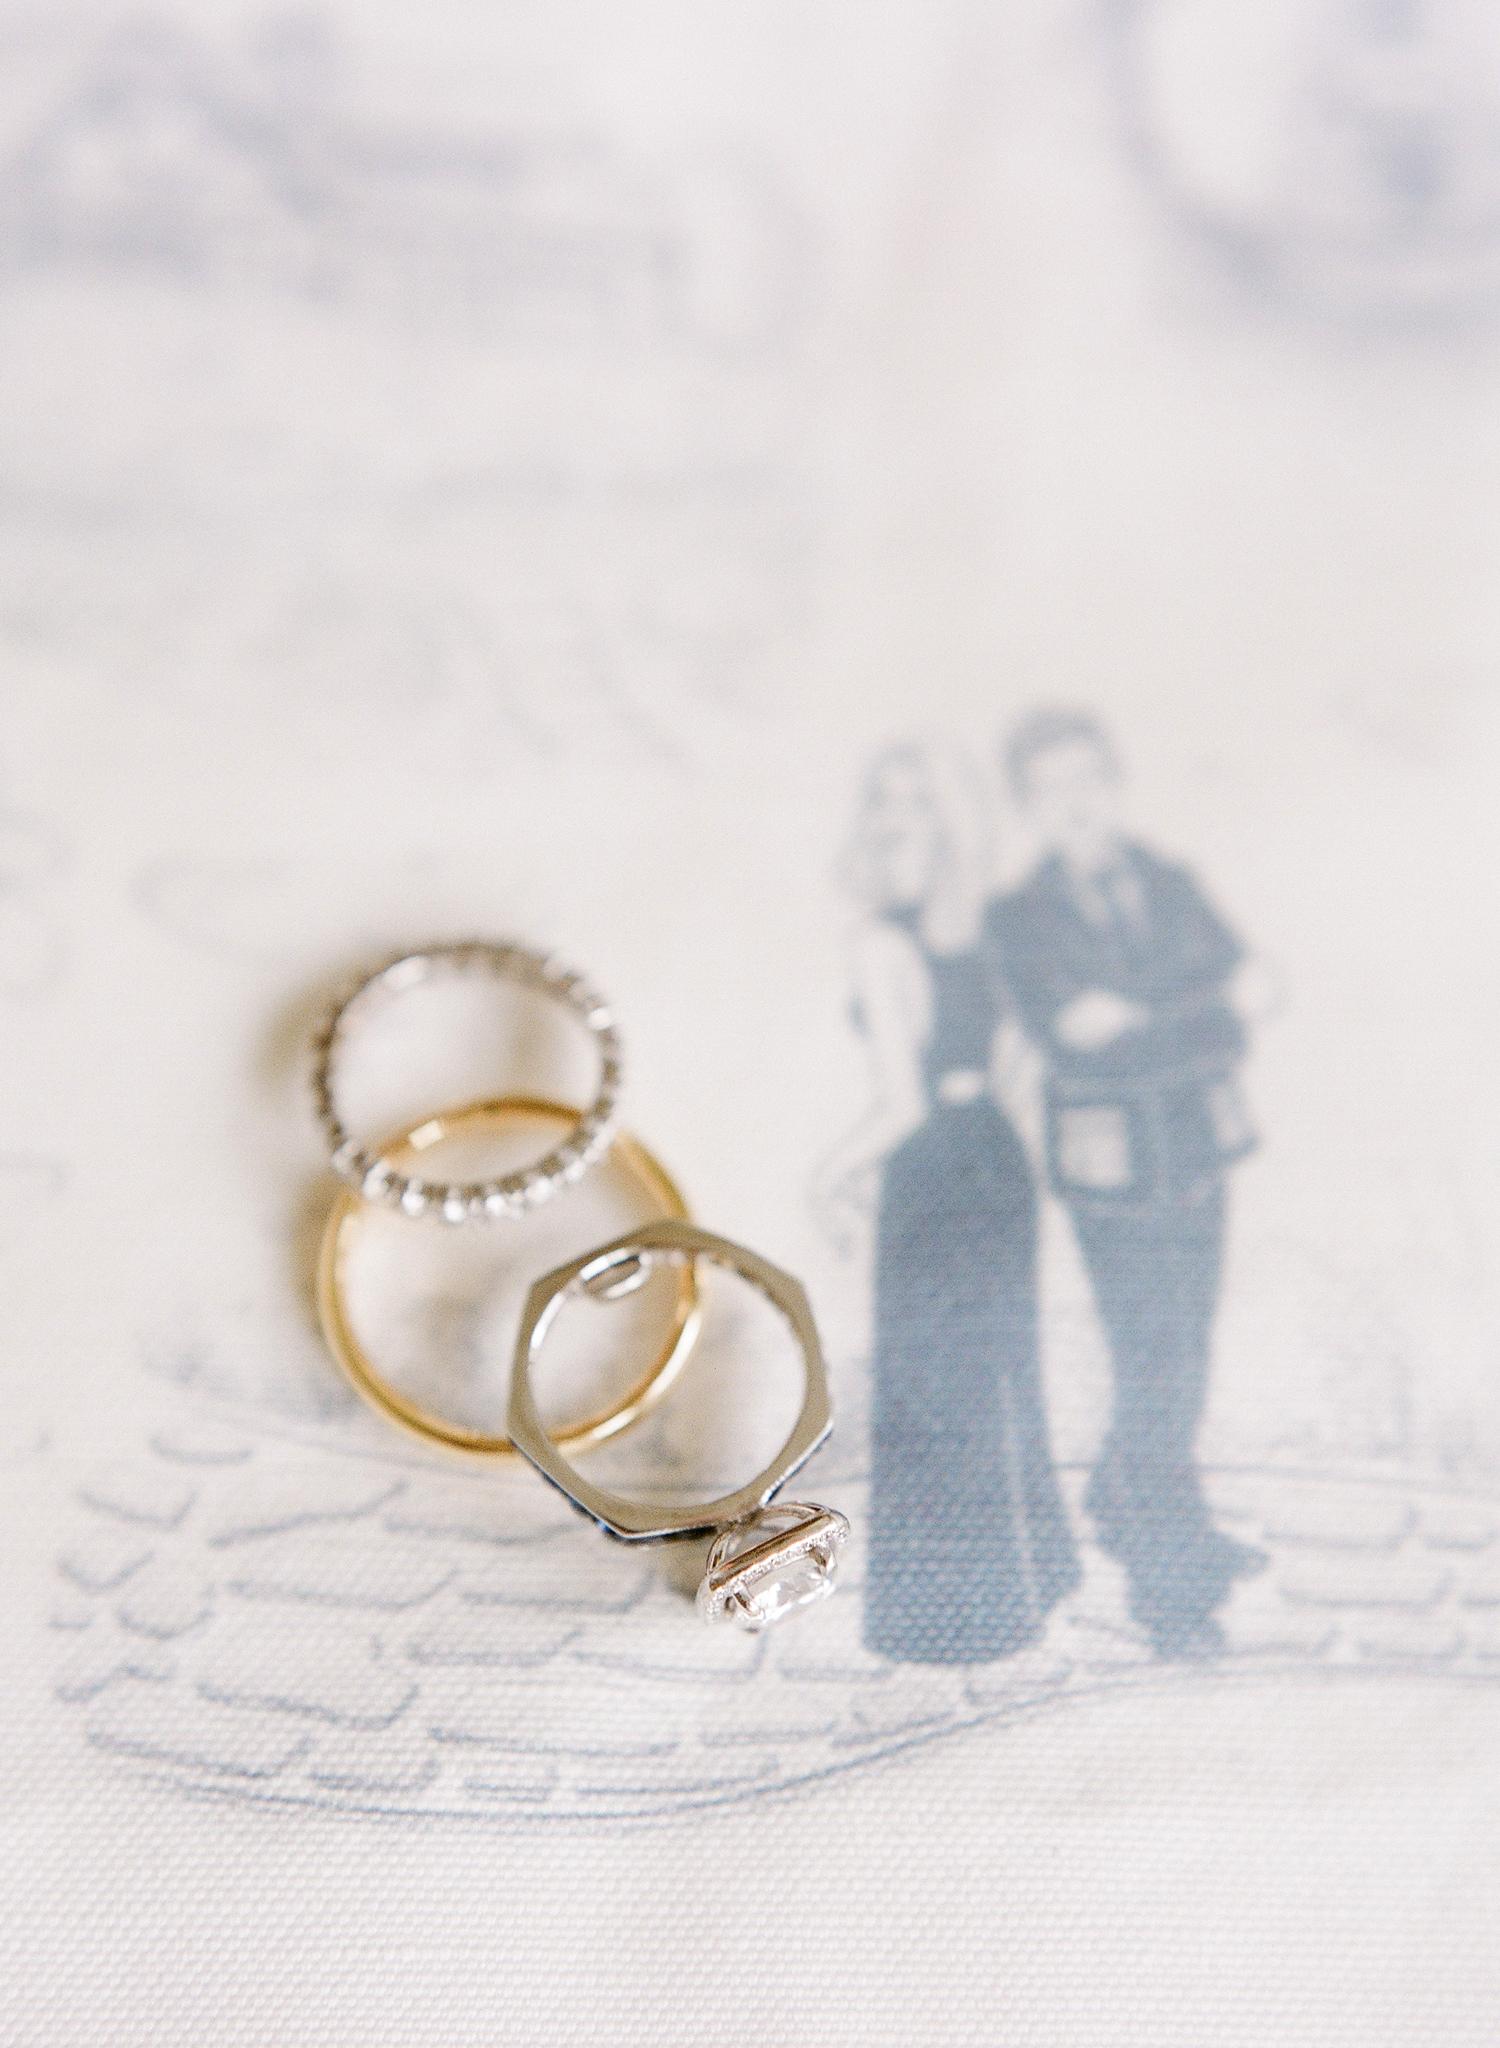 unique silver hexagonal shape wedding ring